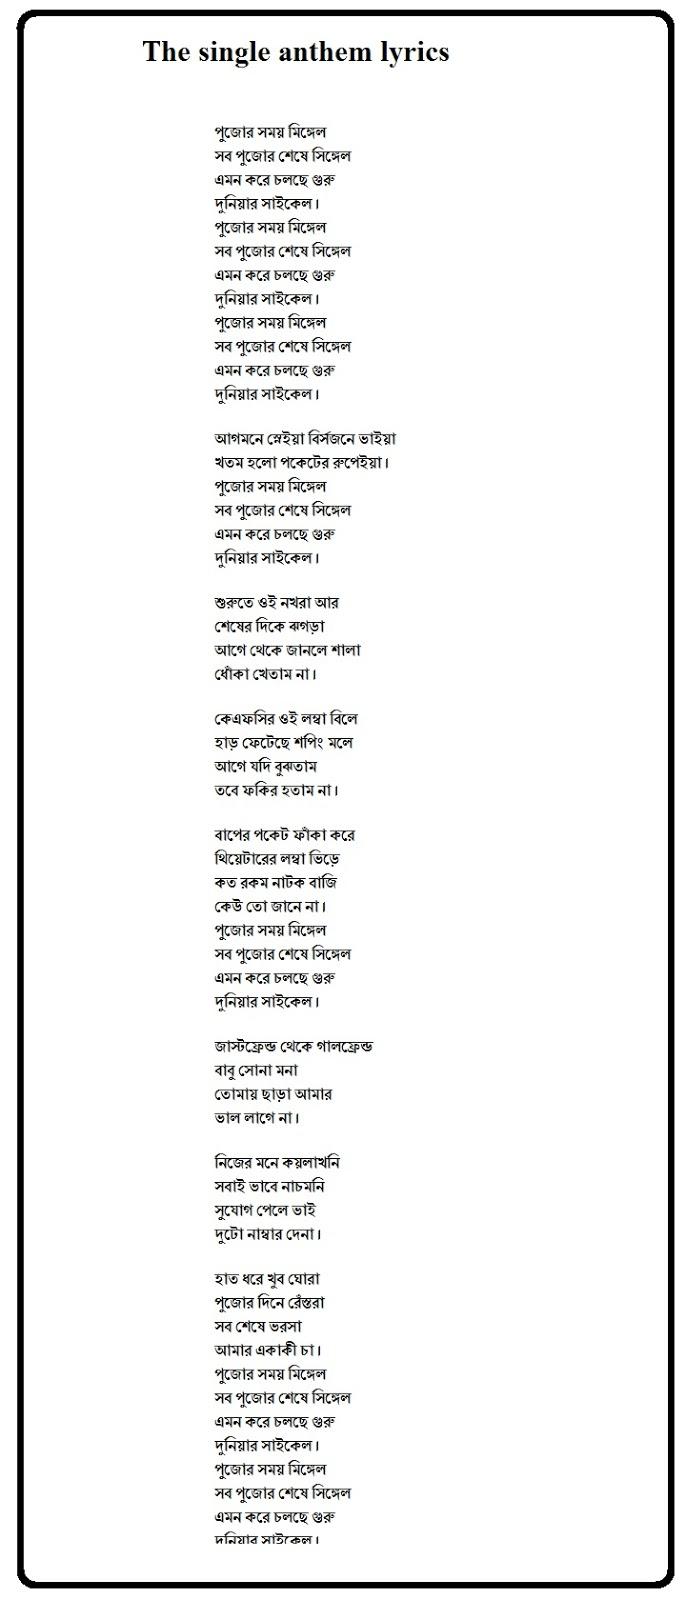 The single anthem lyrics